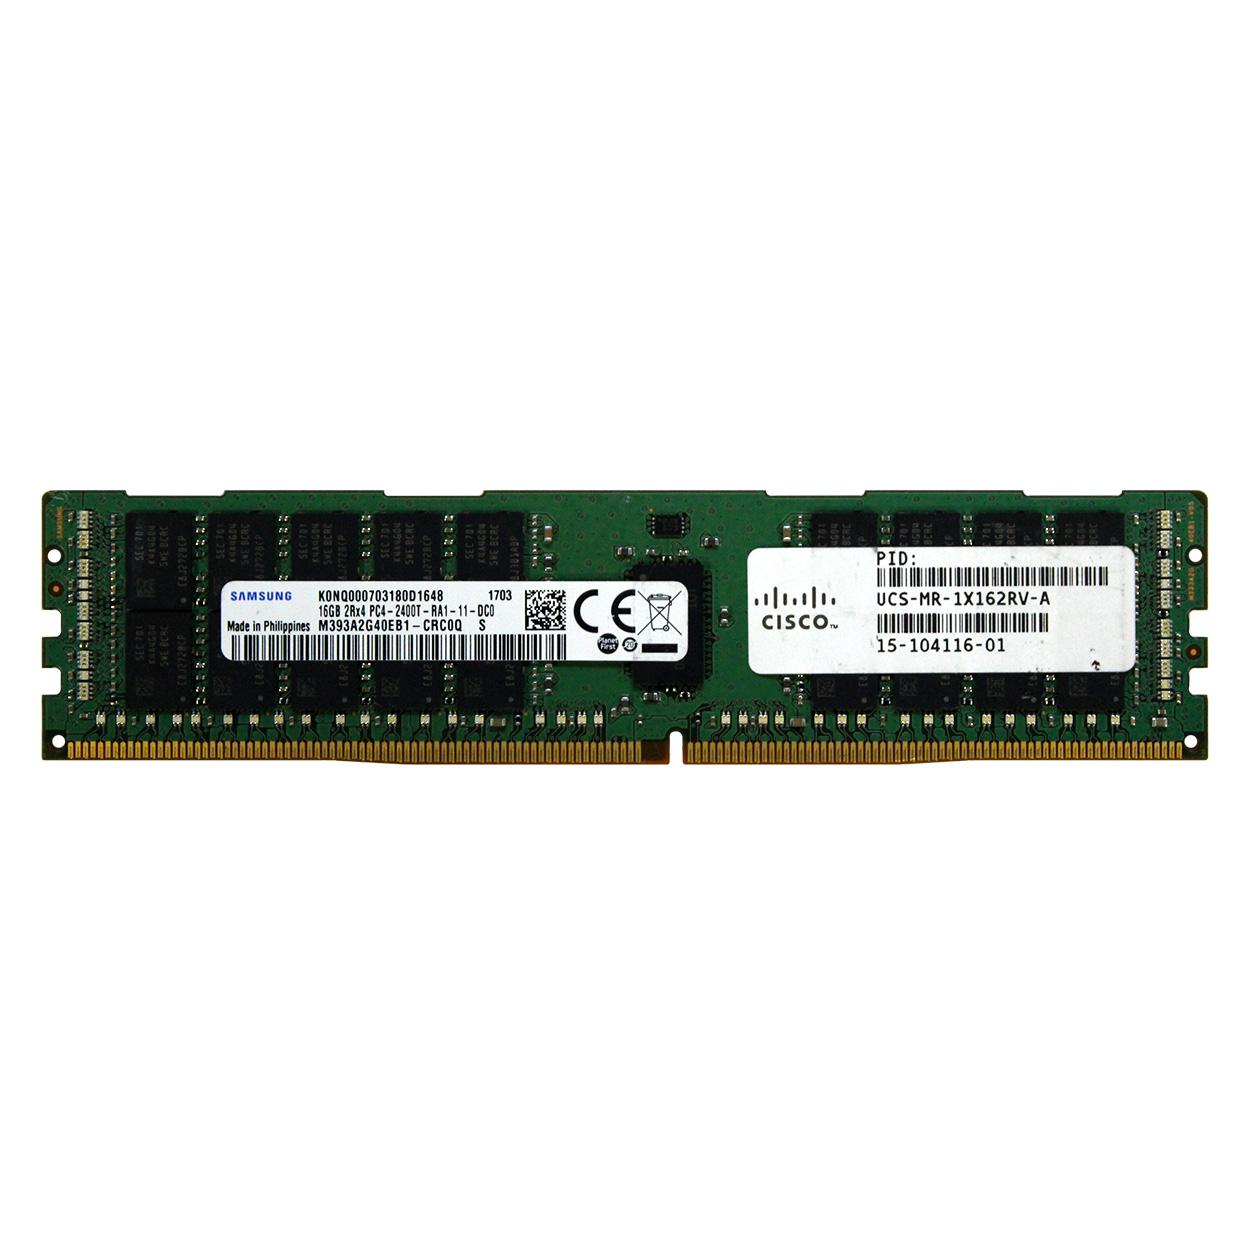 3x16GB DDR3 PC3-8500R 4Rx4 ECC Reg Memory RAM Cisco UCS C200 M2 B200 M2 48GB